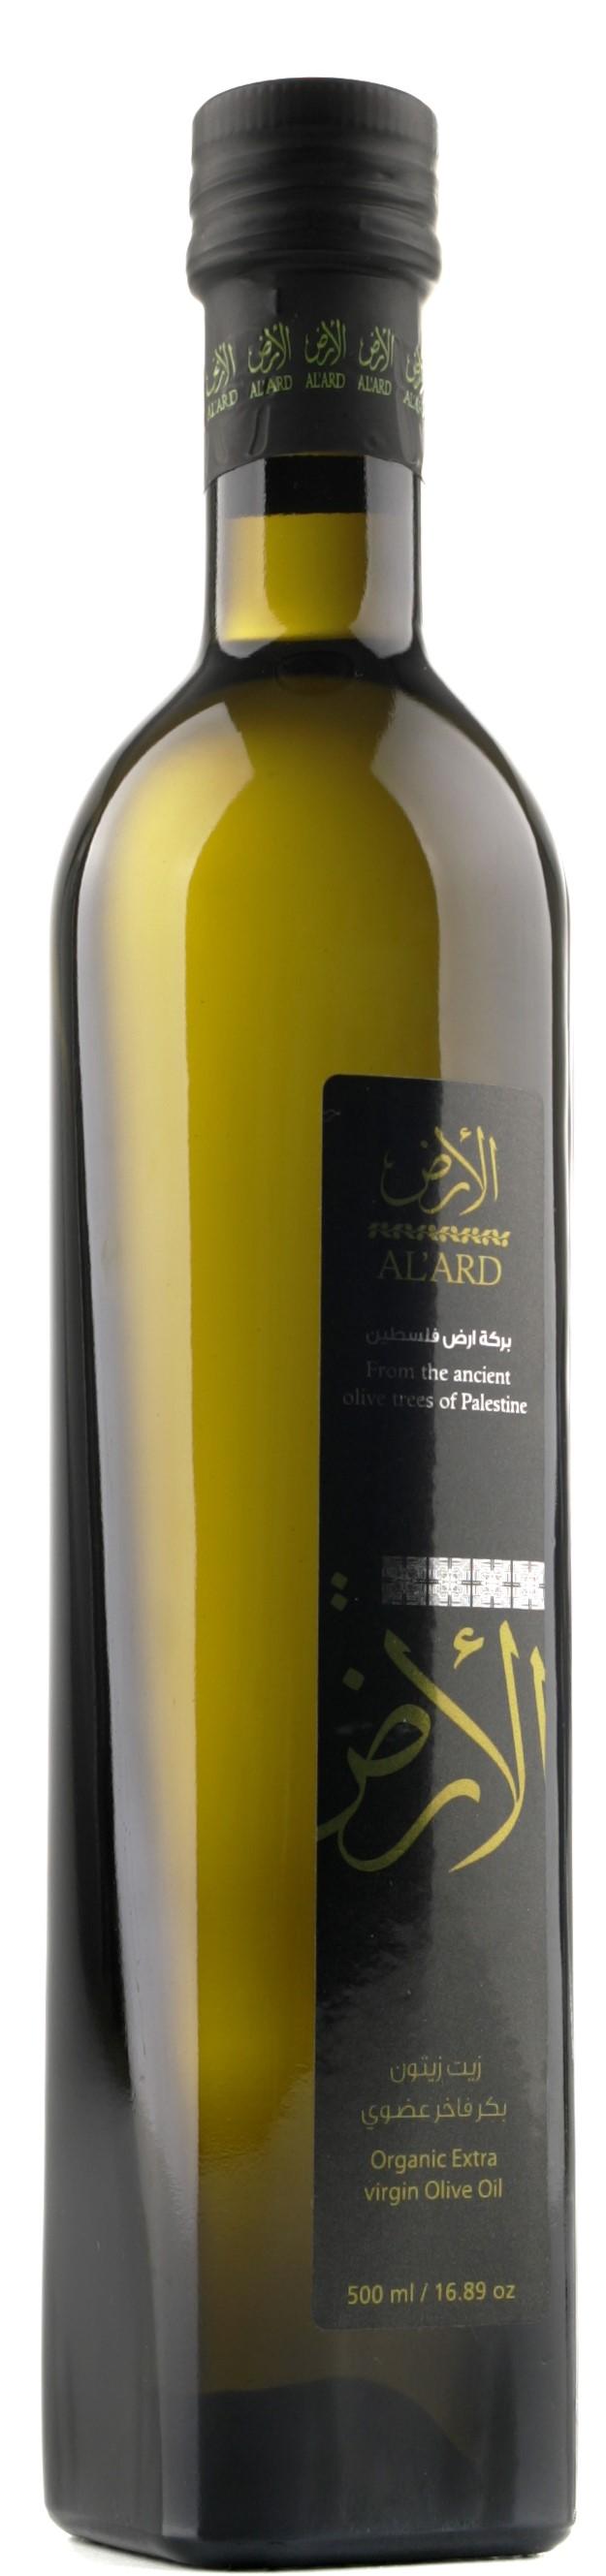 Organic extra virgin palestinian olive oil